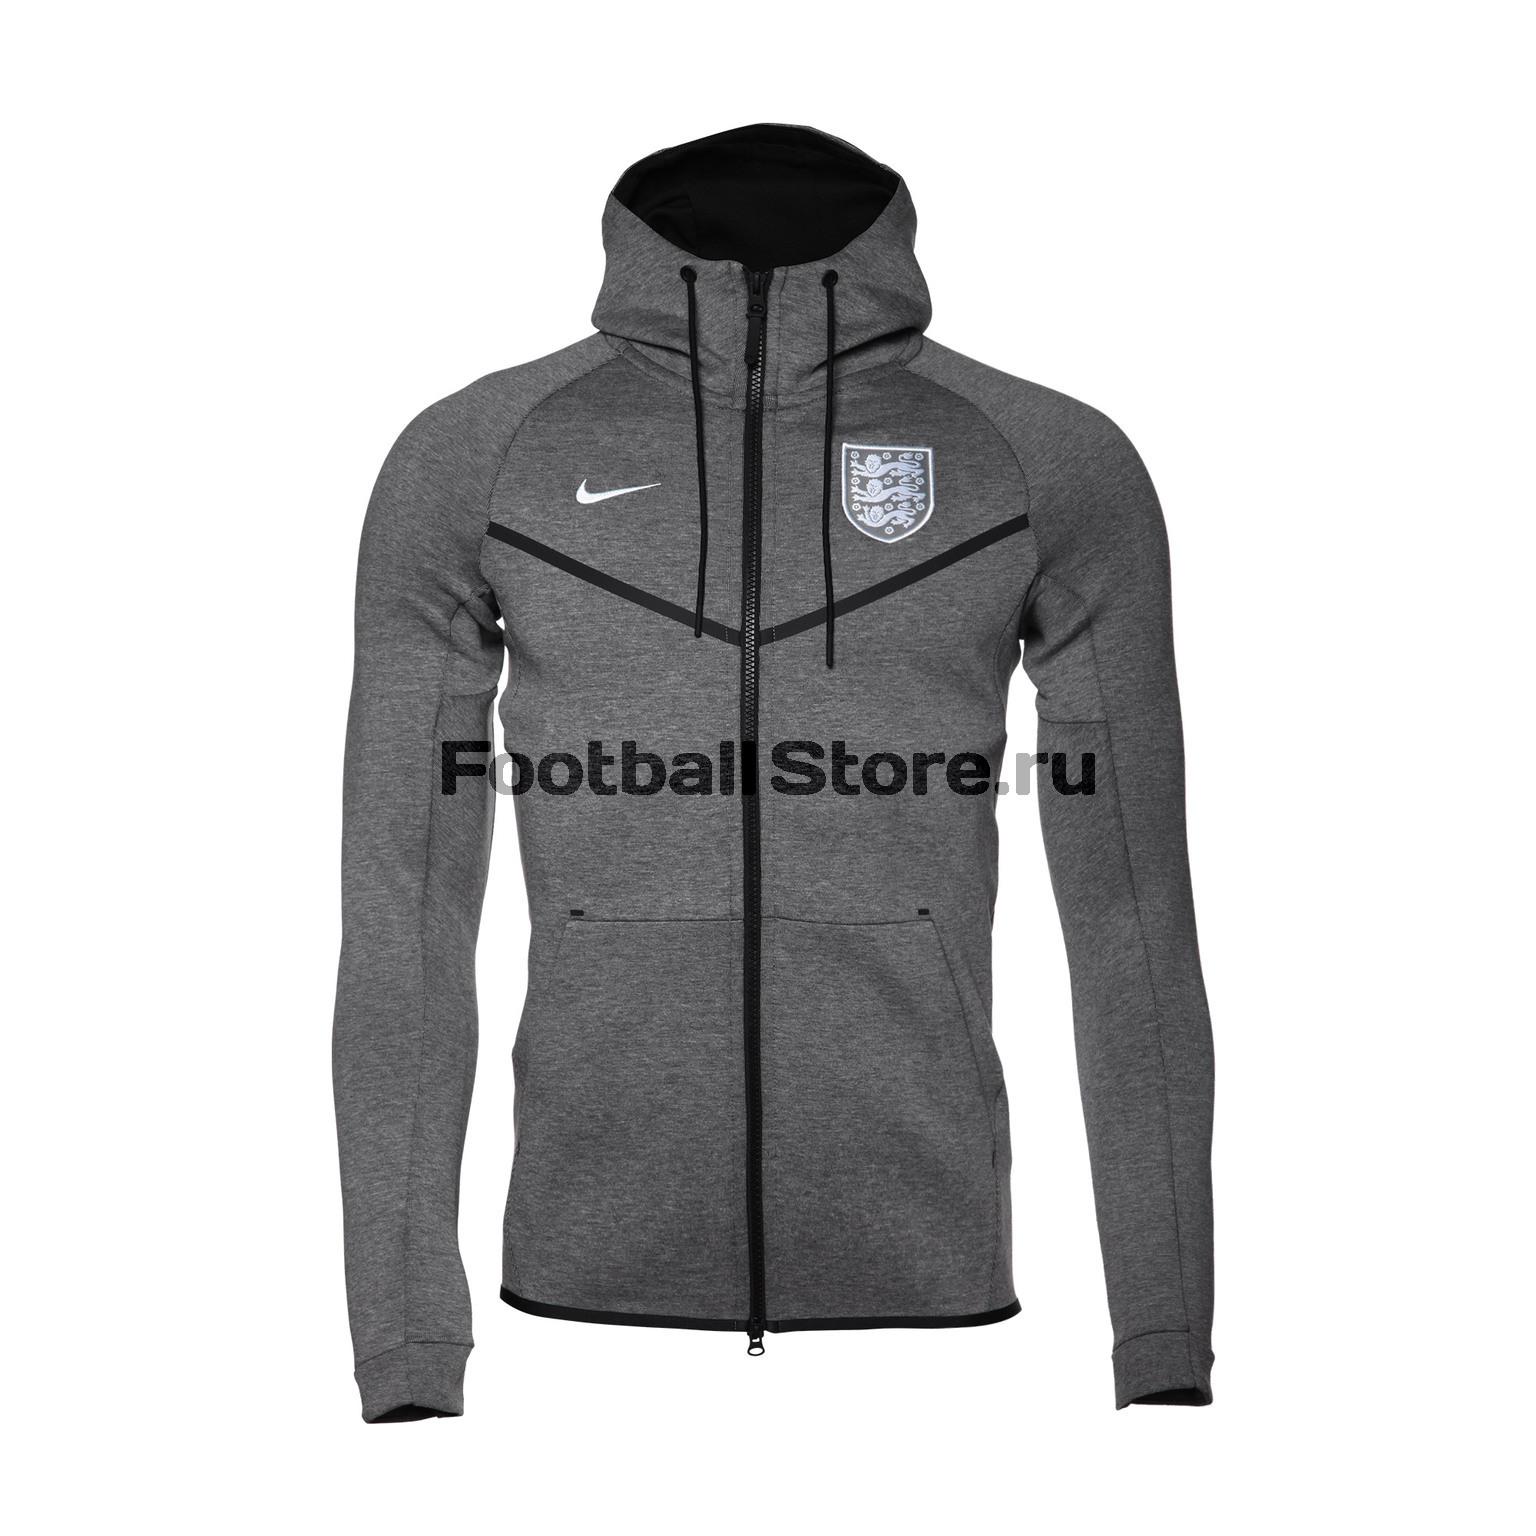 Толстовка Nike сборной Англии 927418-091